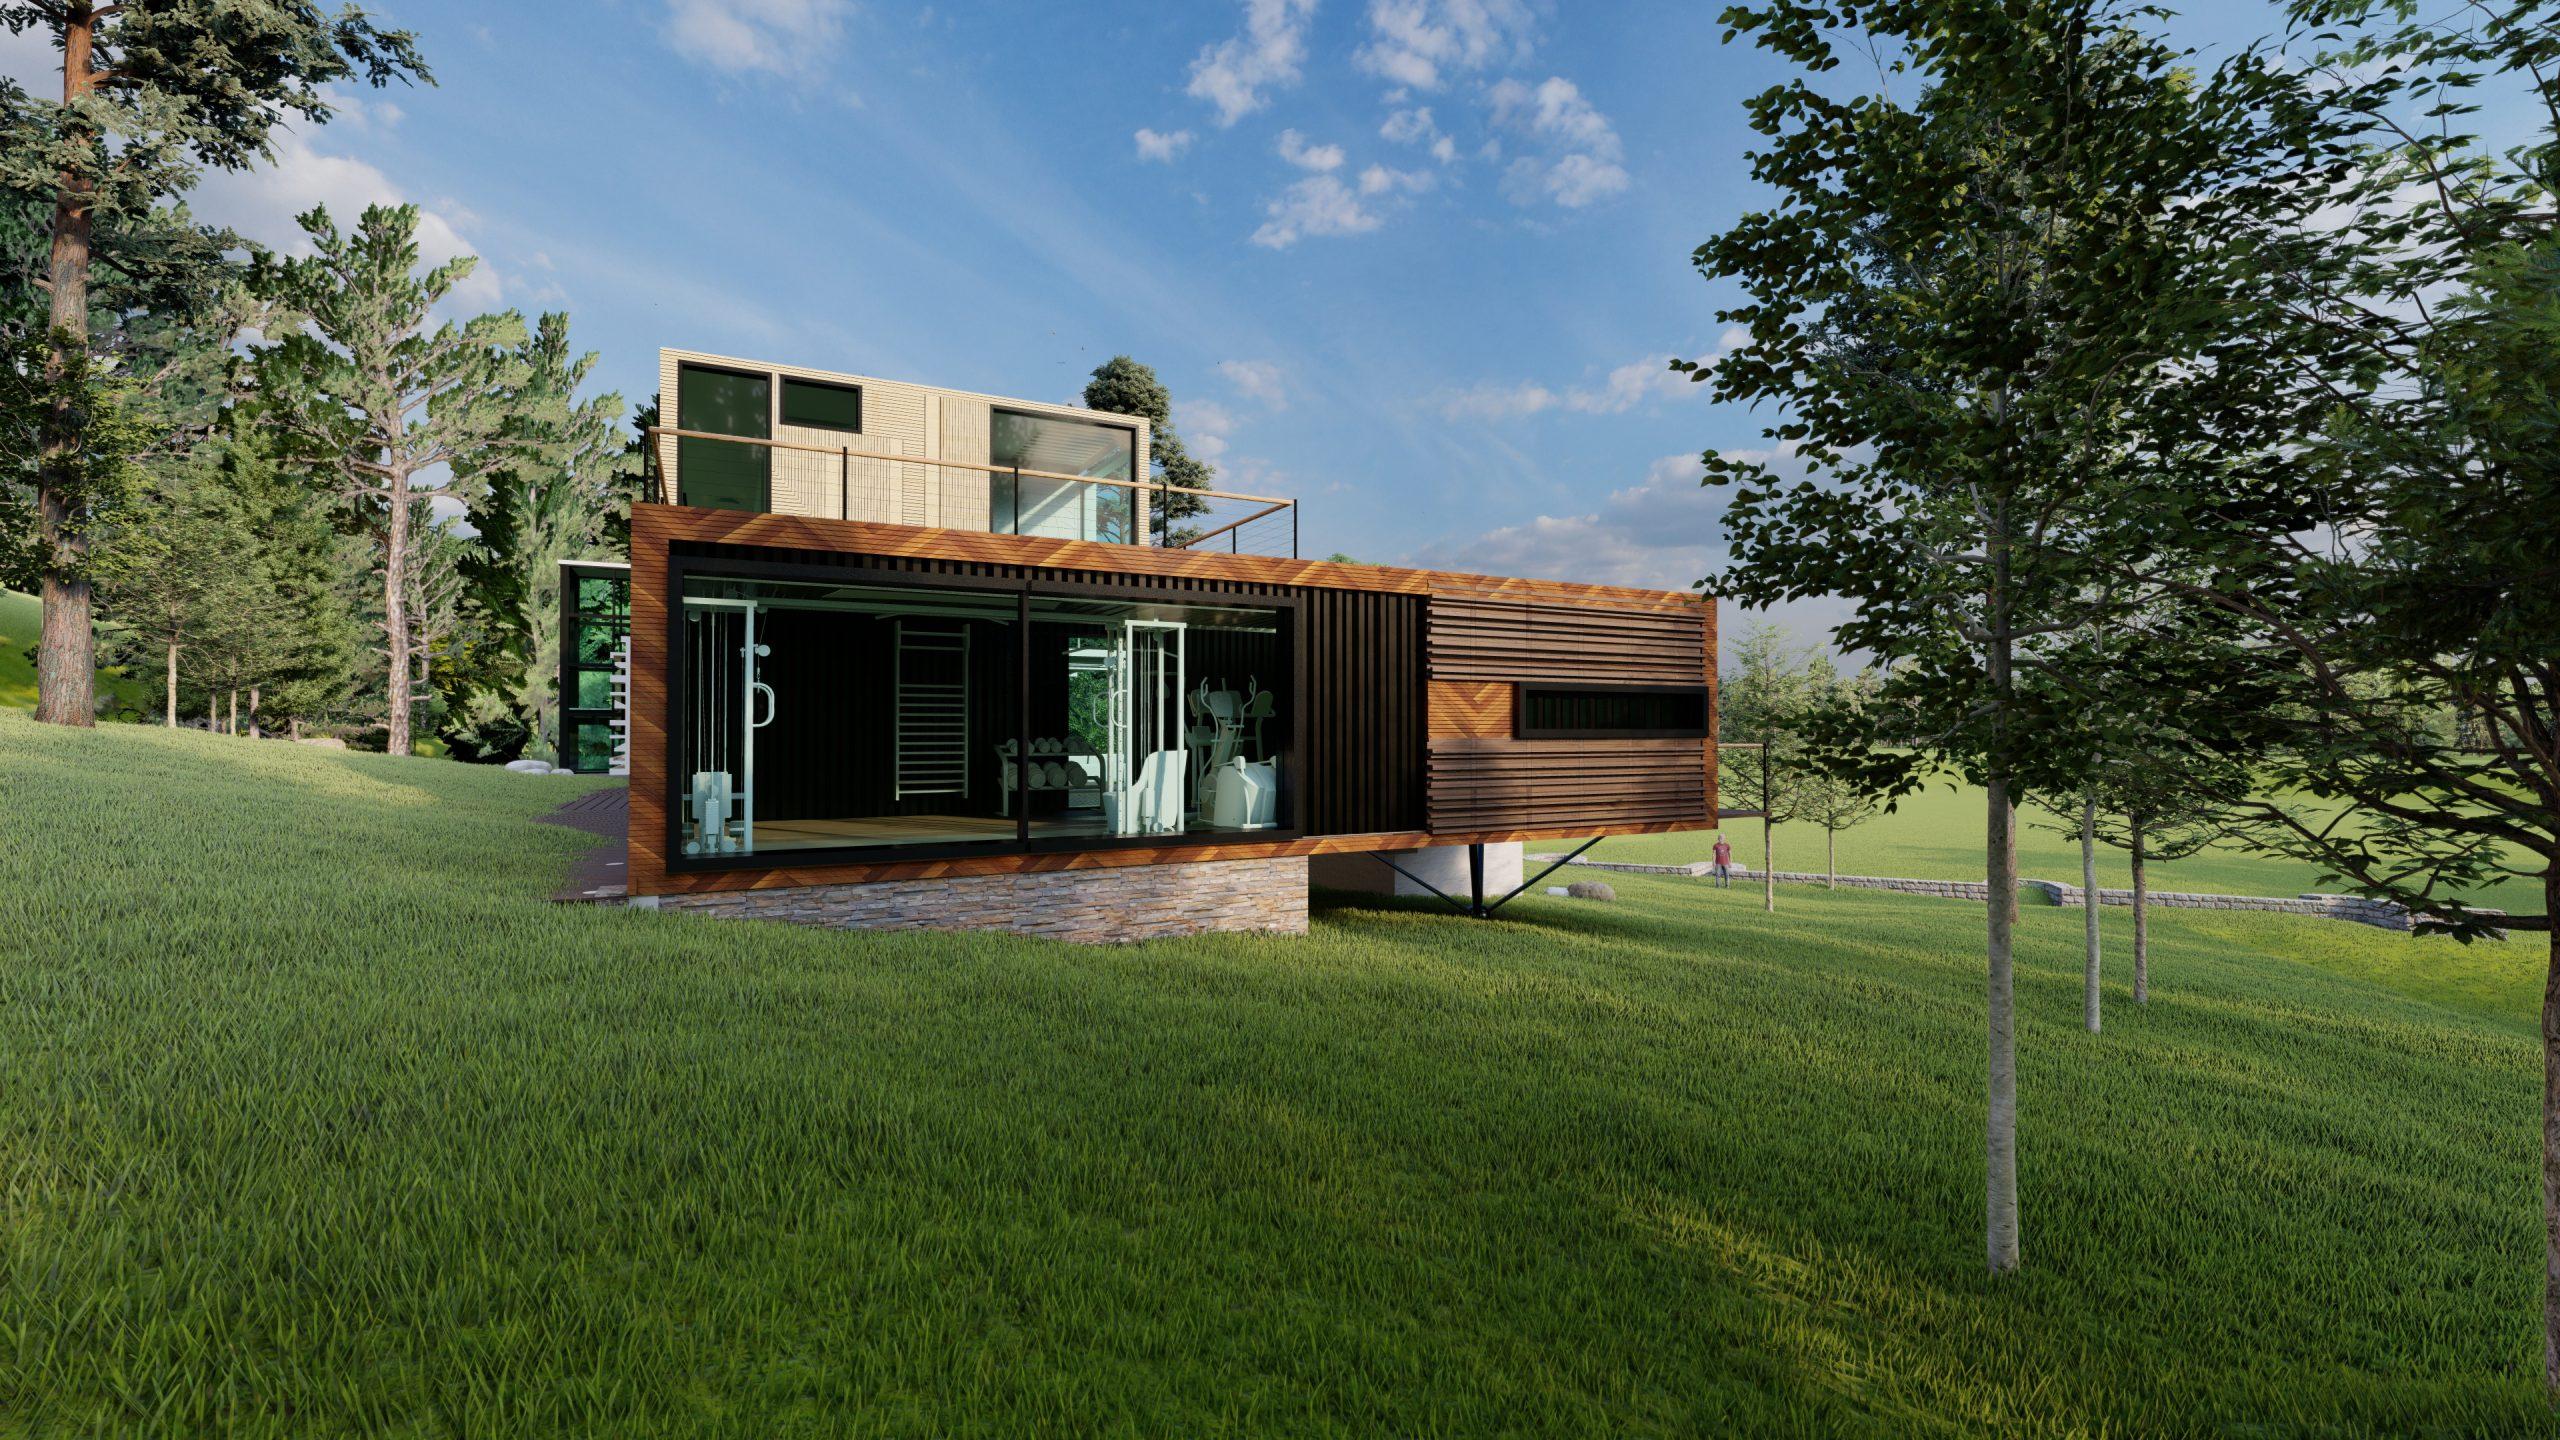 Proyecto Vivienda Modular - 302 m2 -Madrid